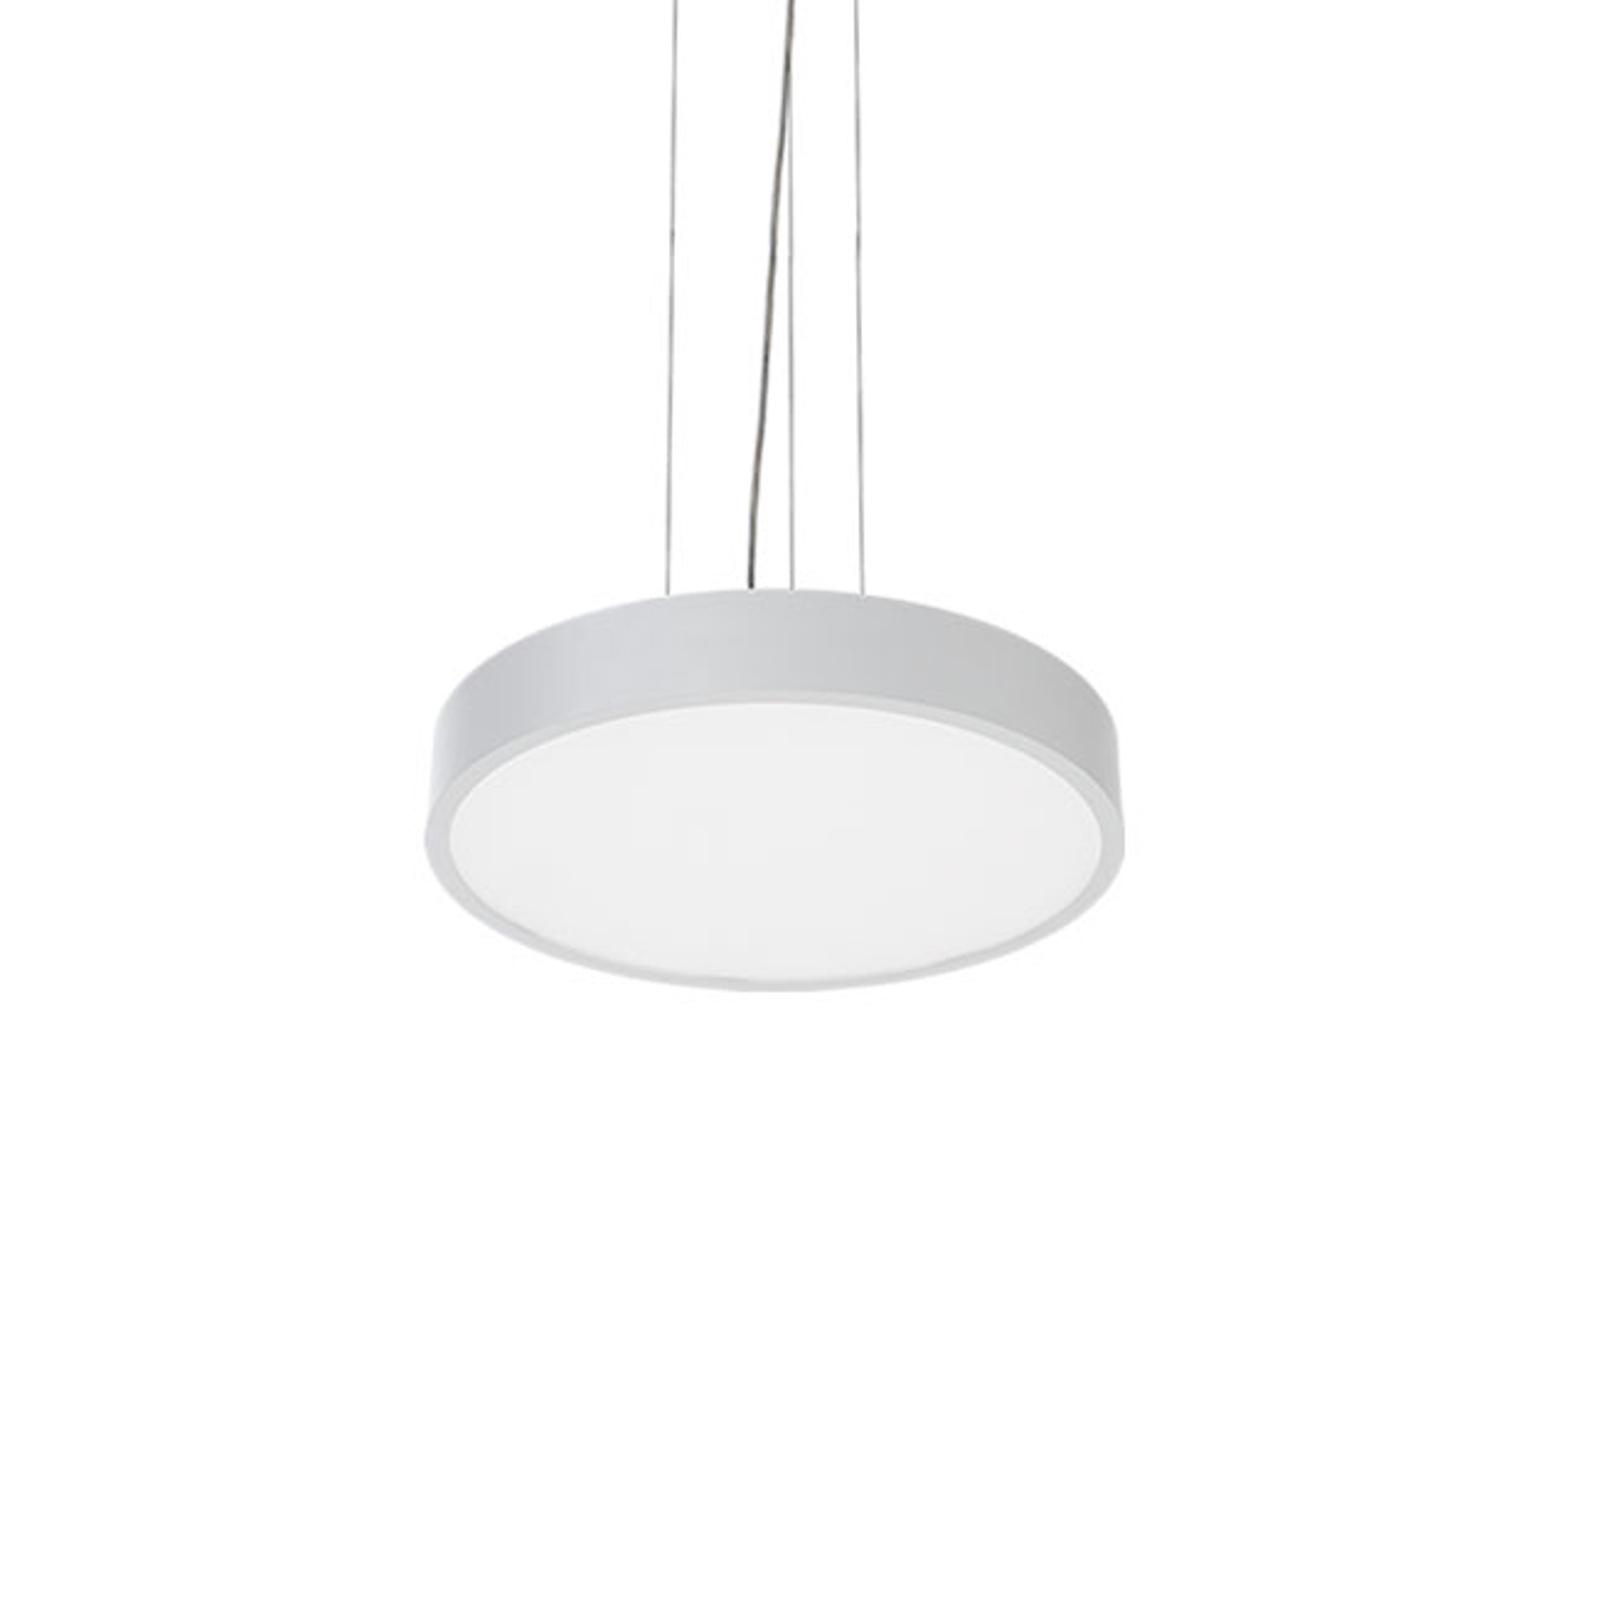 Lampa wisząca LED C90-P, Ø 57 cm, 3000 K, biała